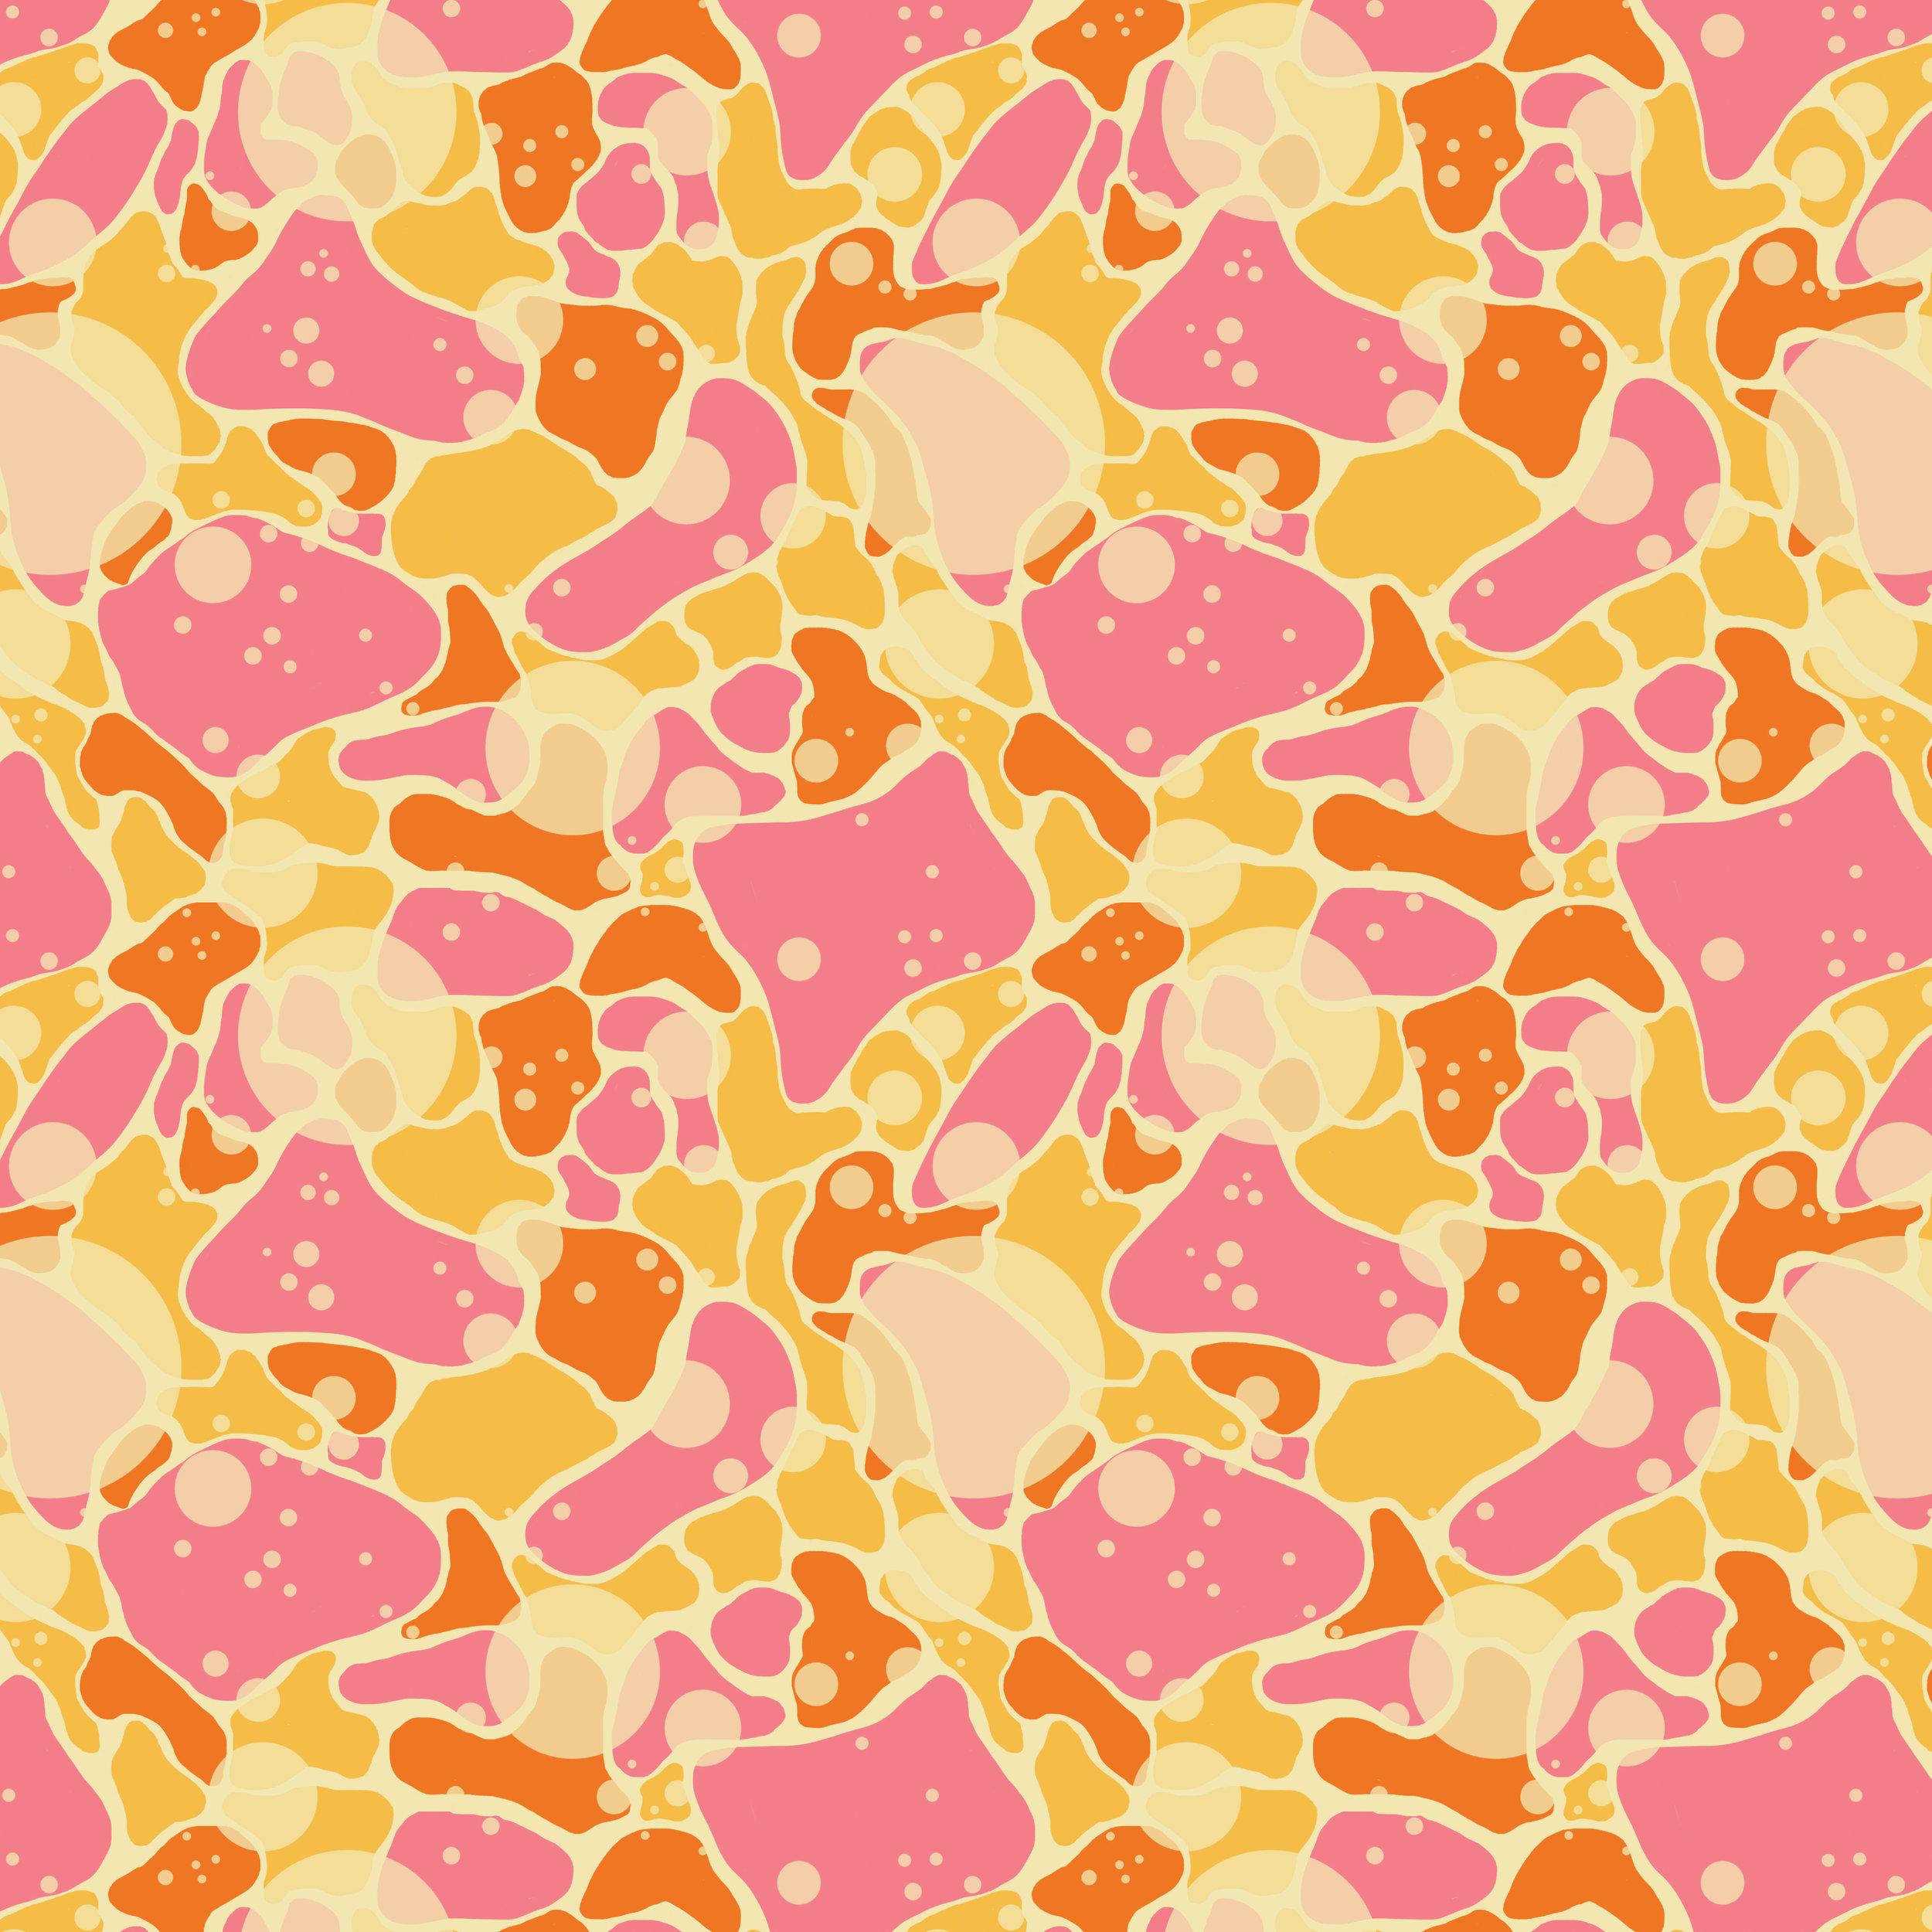 pink bubbles.jpg